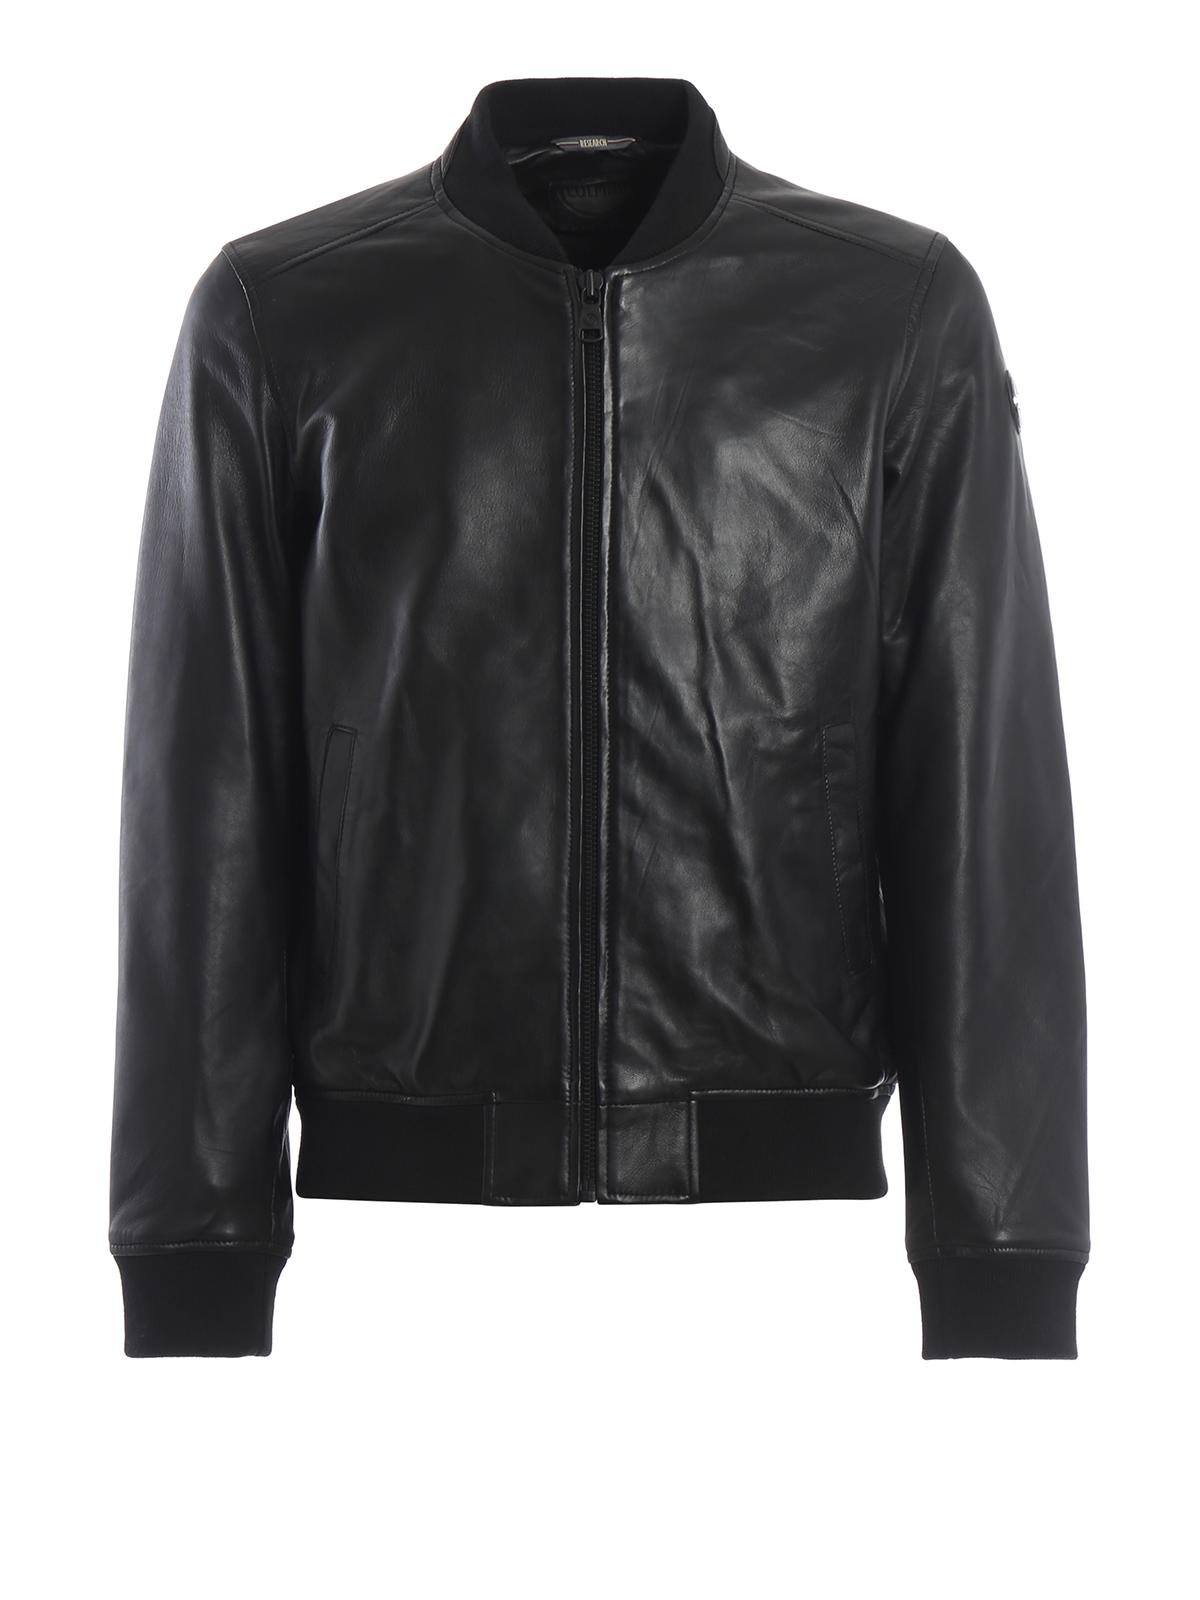 Colmar Originals Bomber Creation in pelle nera giacche